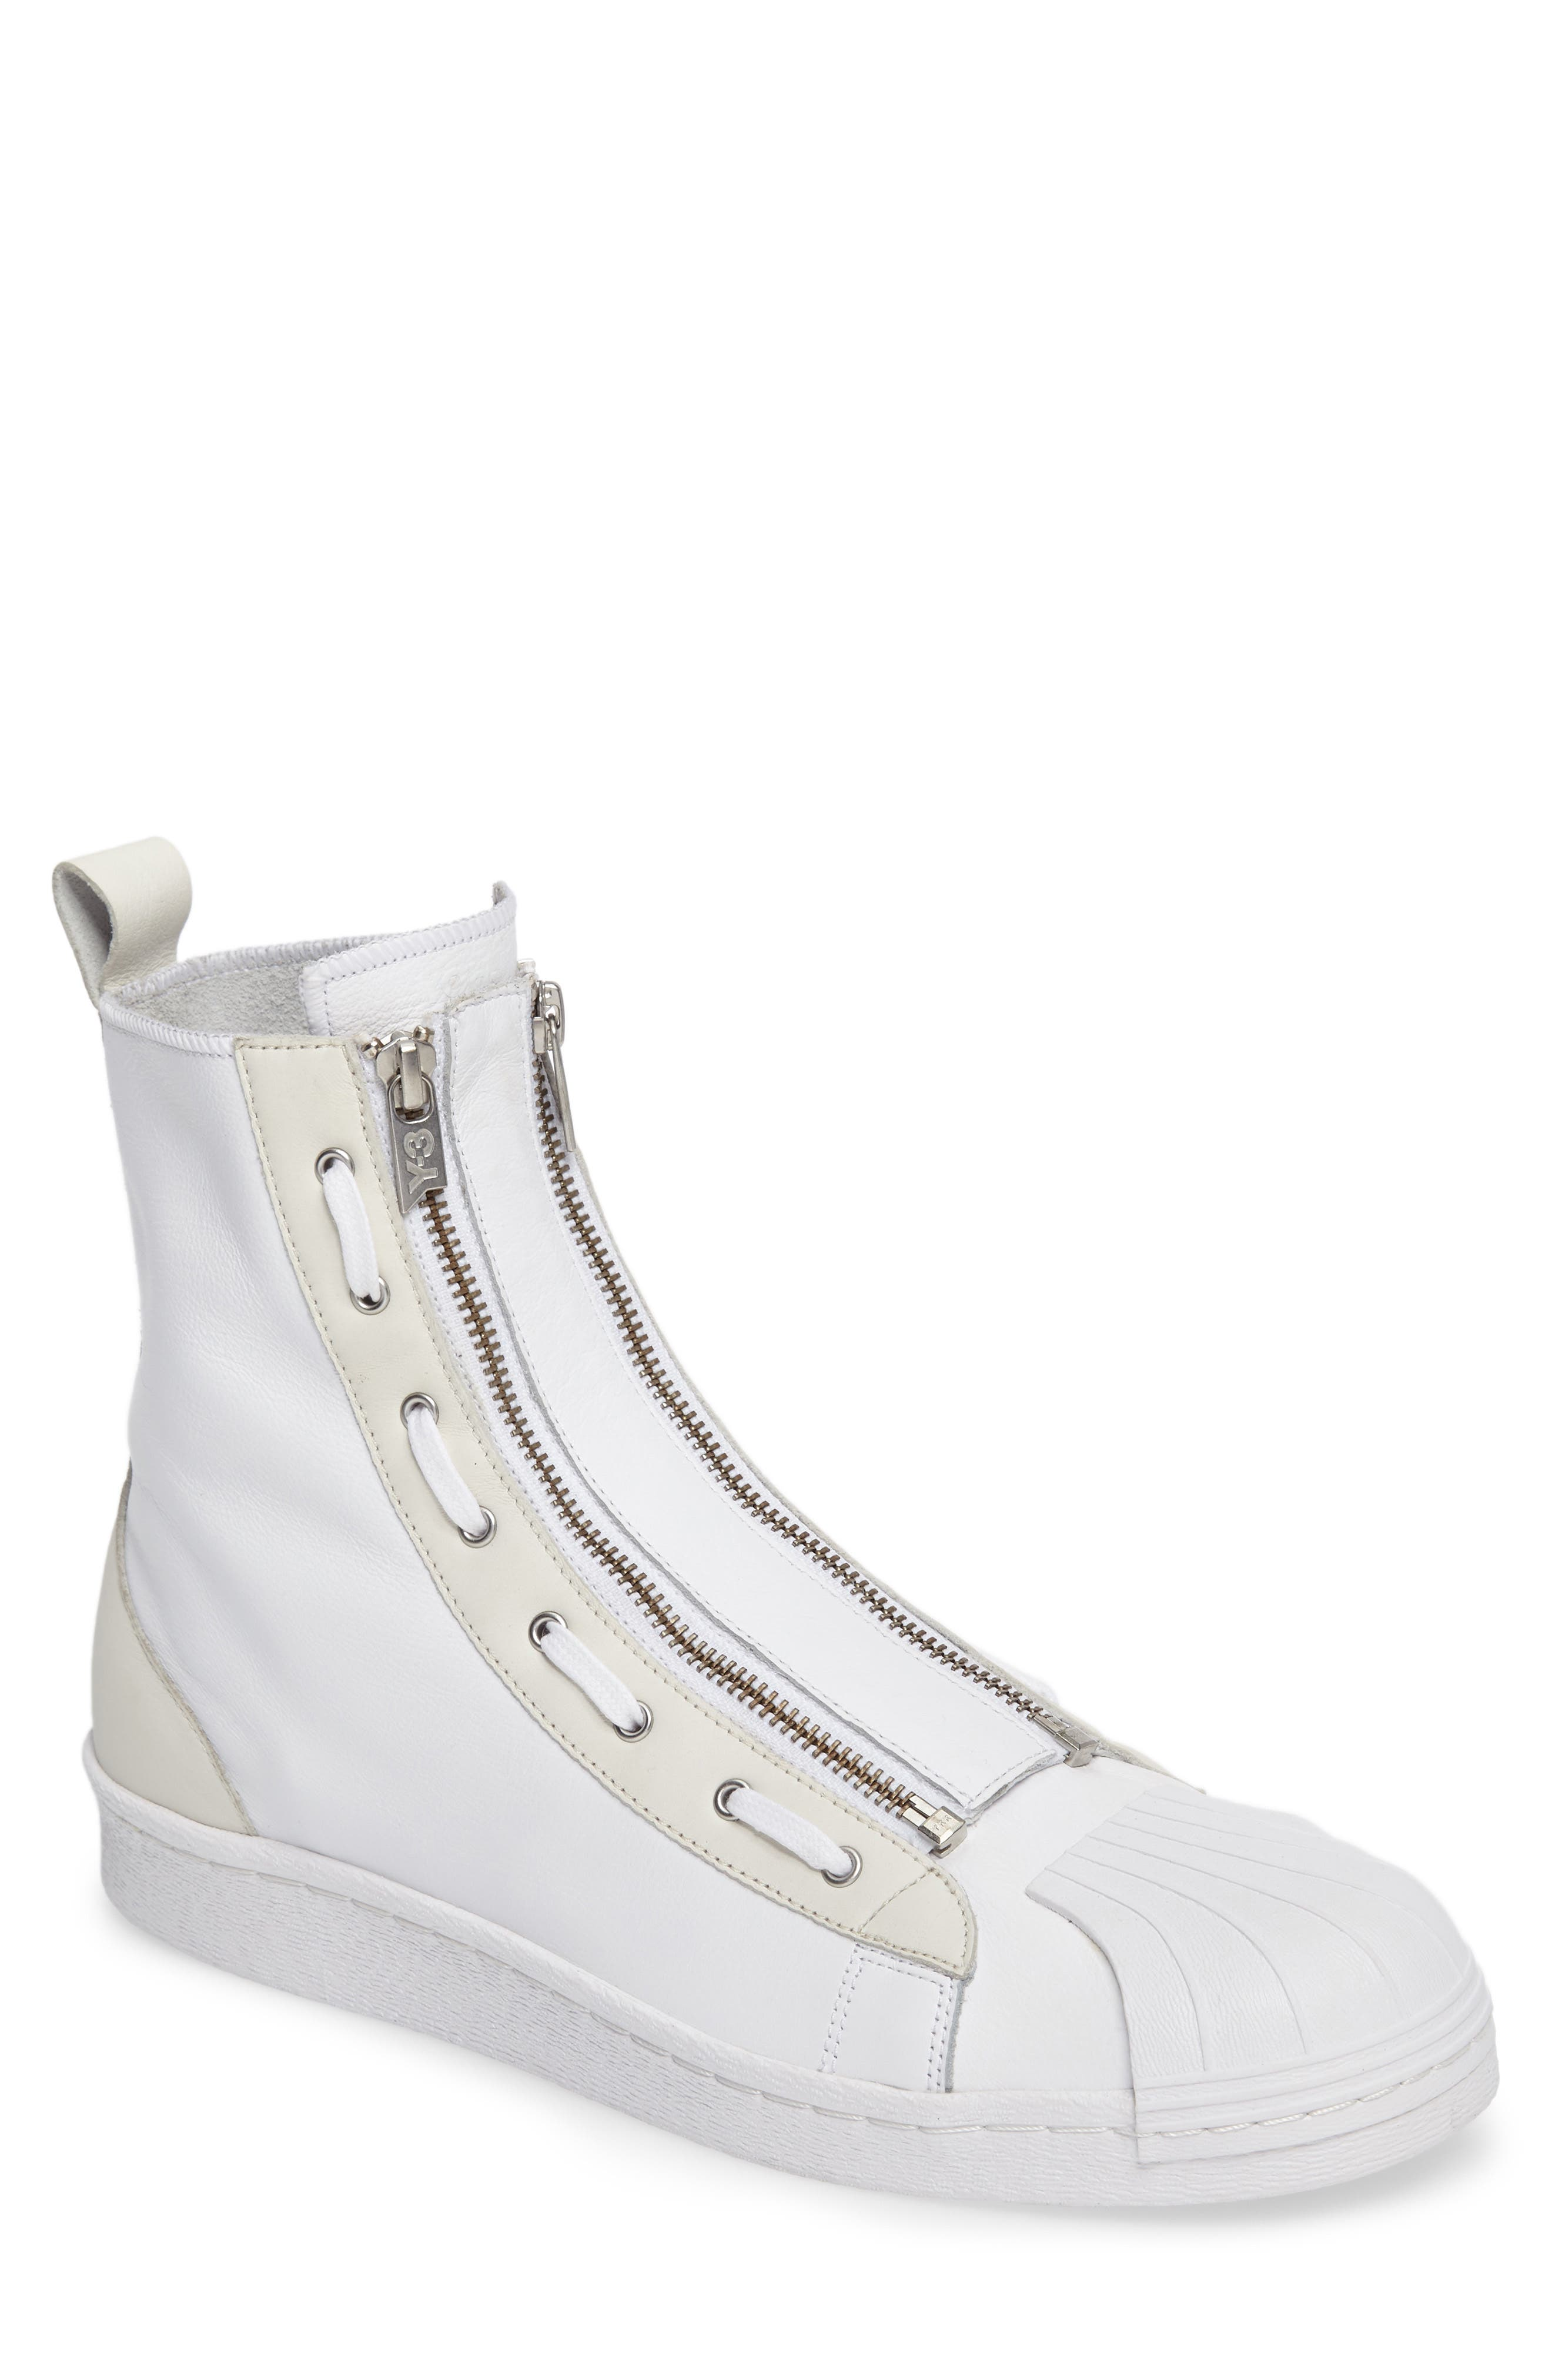 Main Image - Y-3 'Pro' High Top Sneaker (Men)